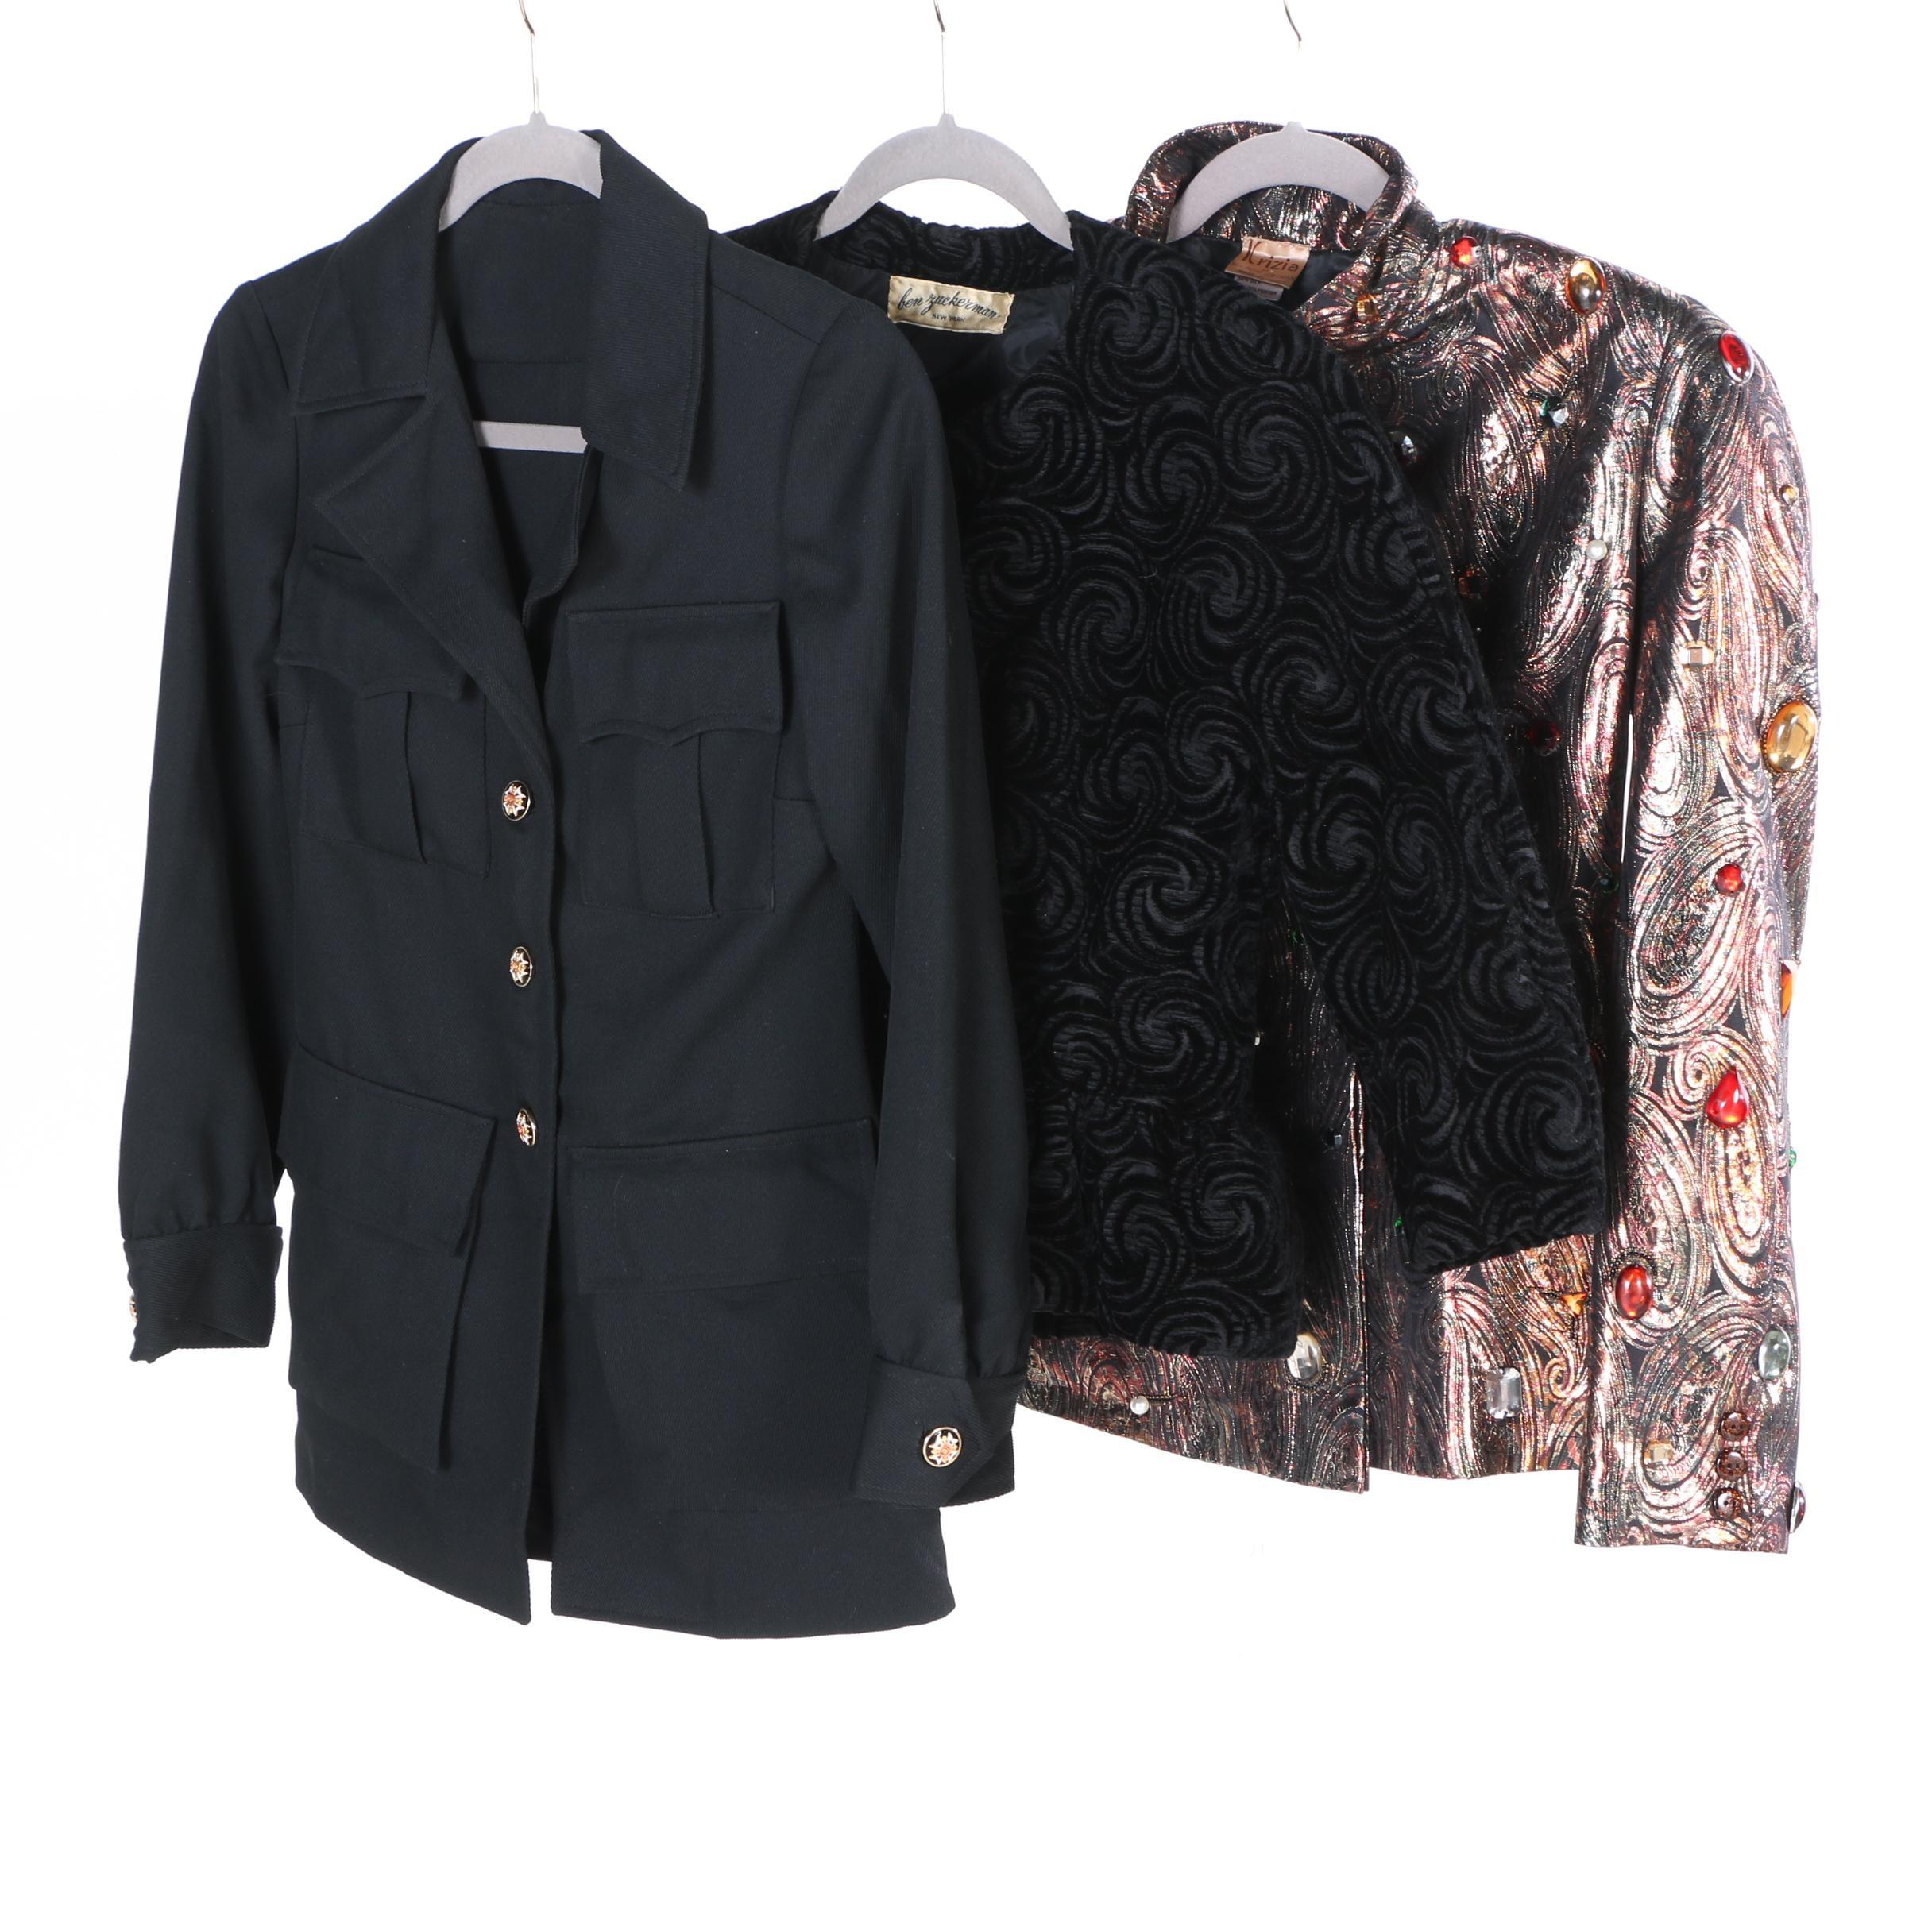 Women's Vintage Jackets Including Krizia